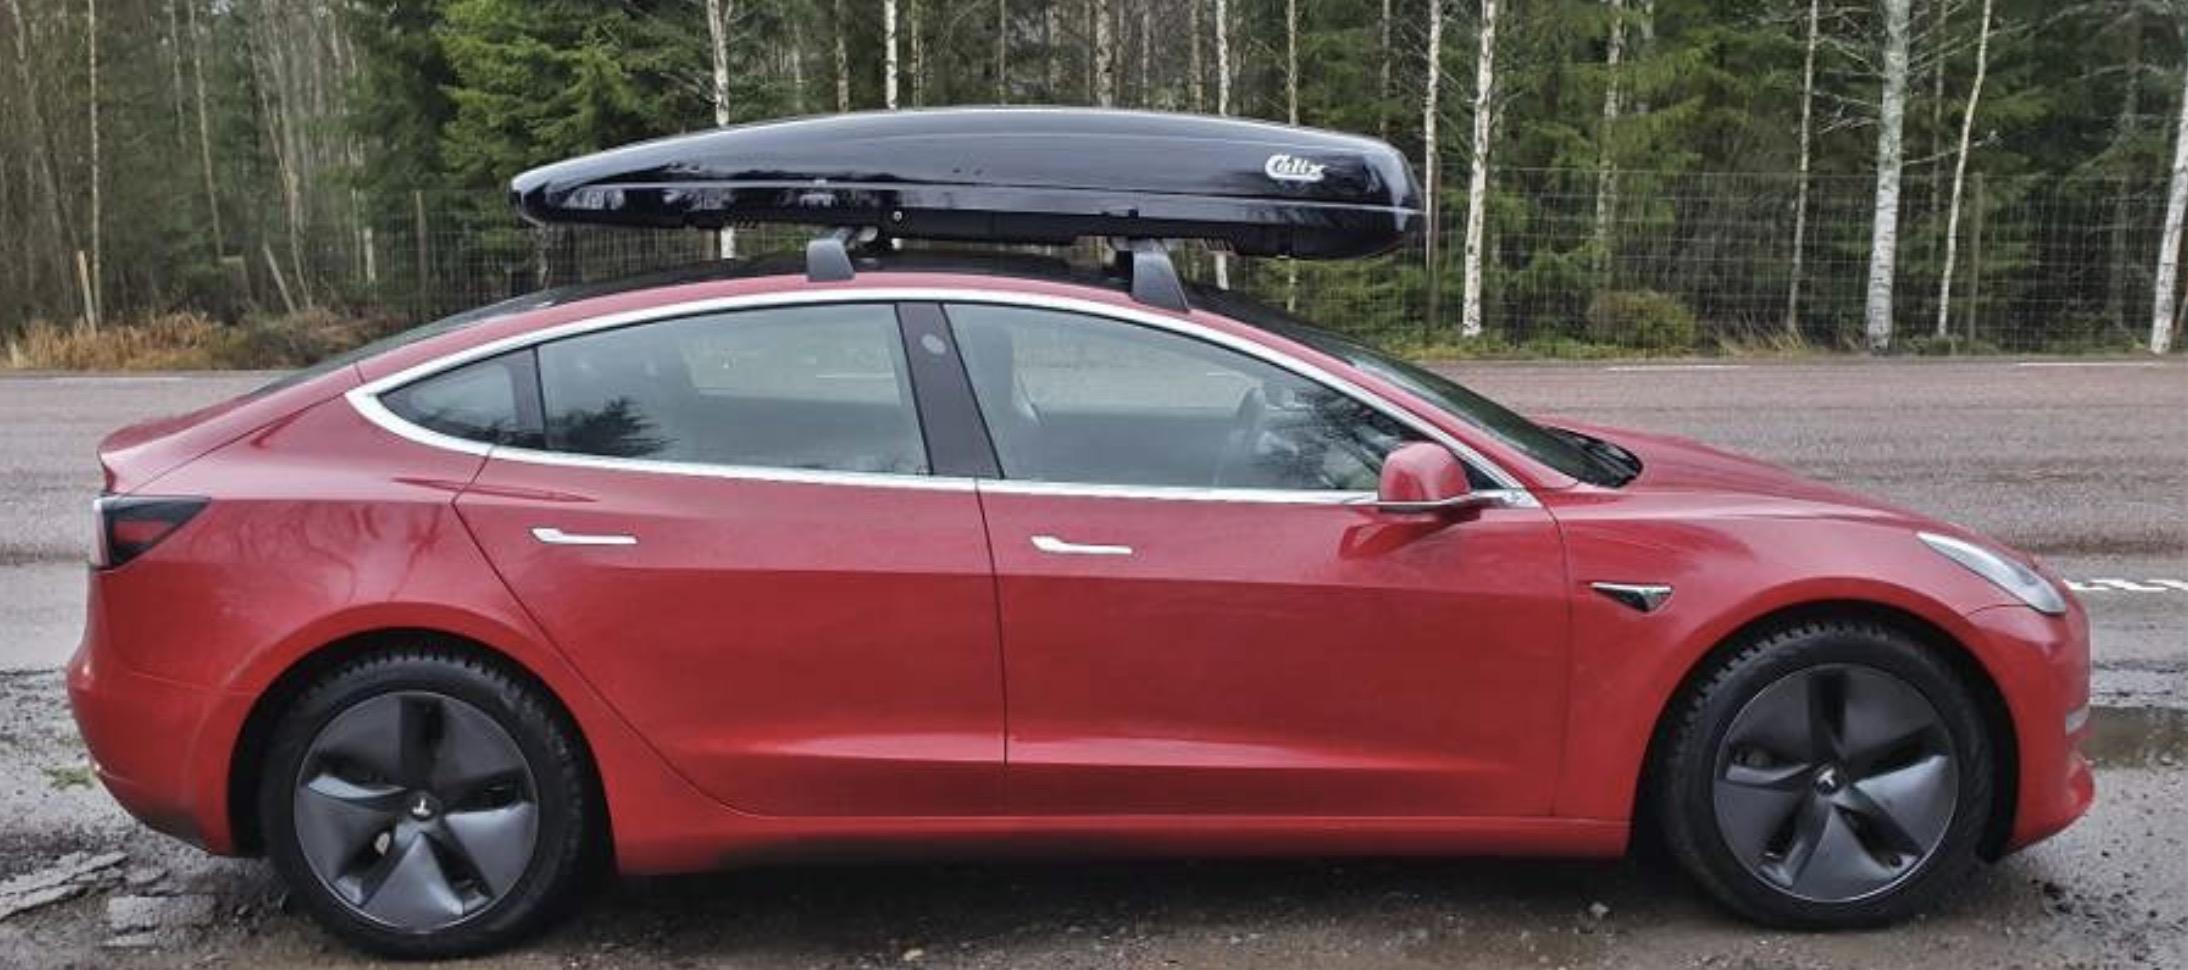 TEsla-Model-3-roof-rack.jpg